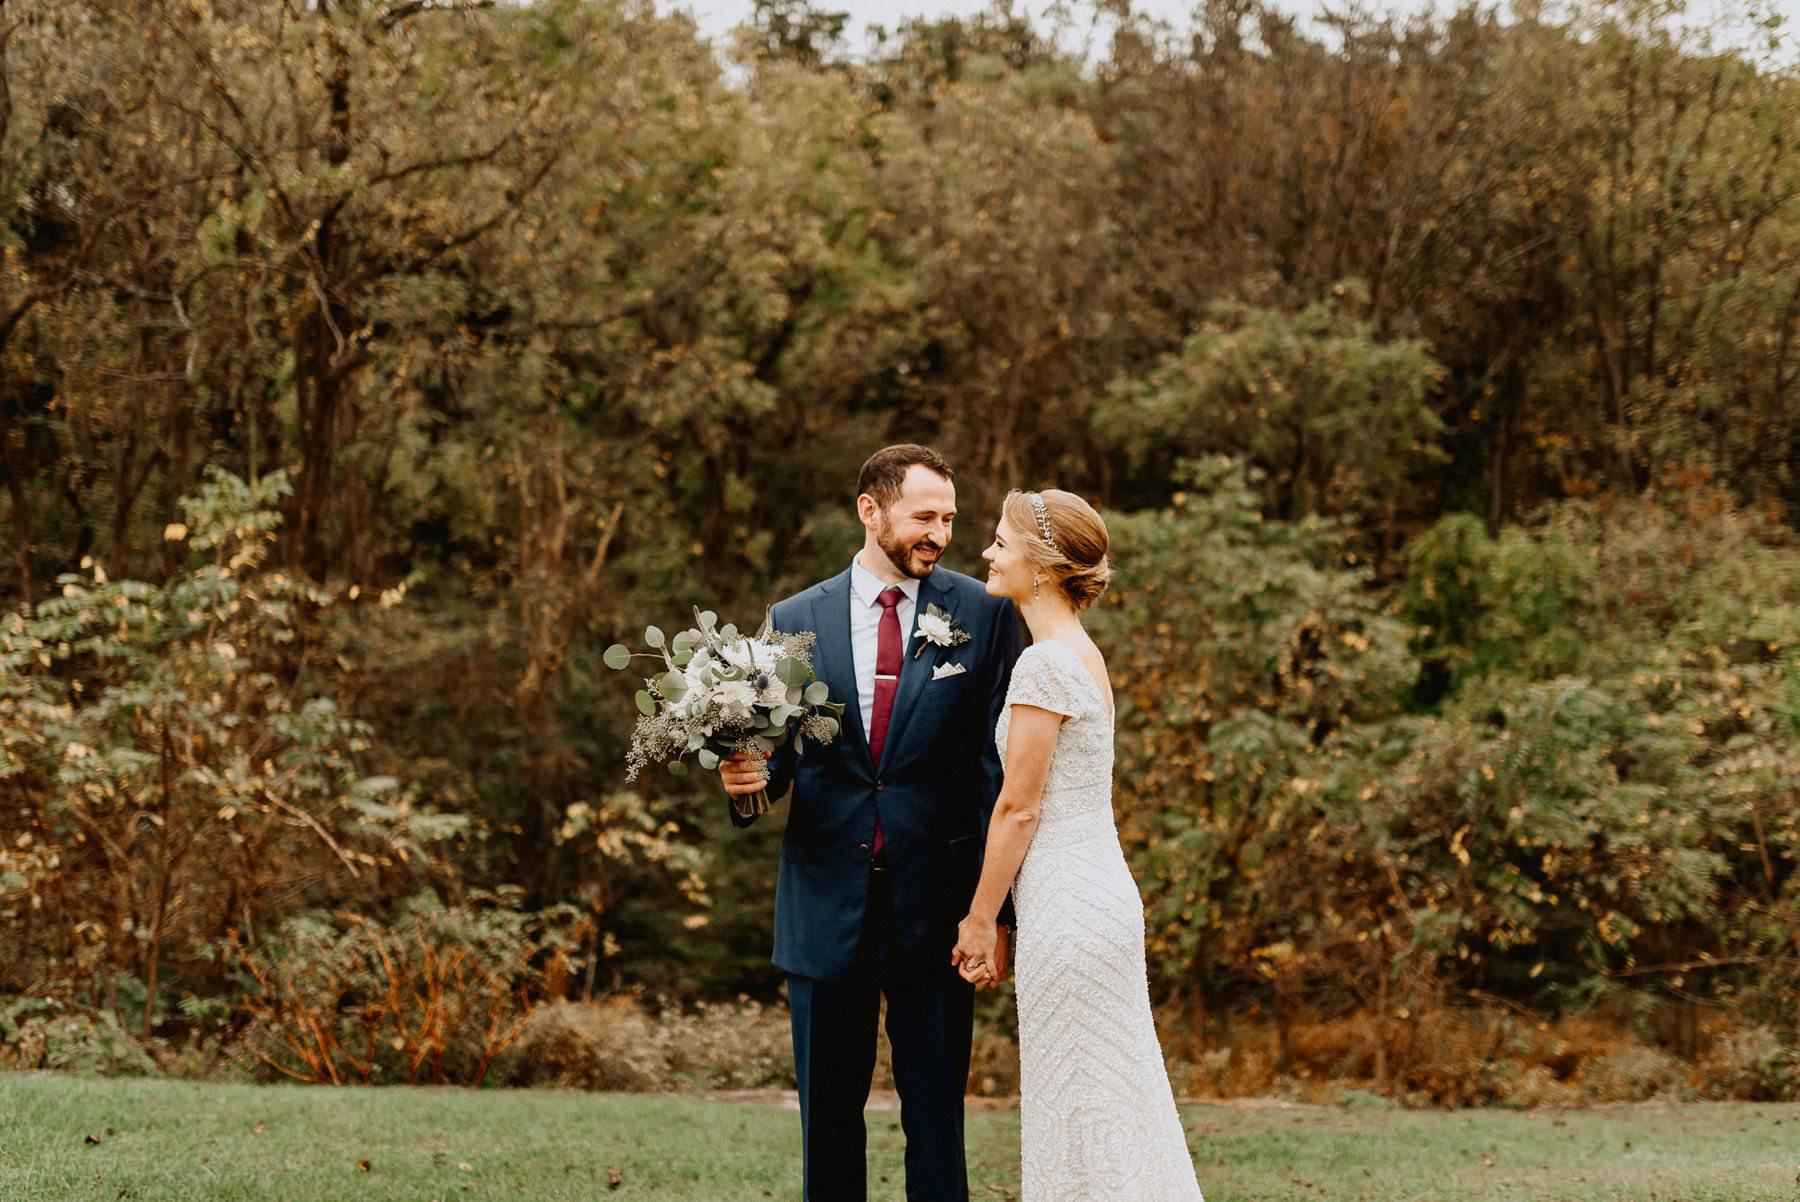 John_James_Audubon_Center_wedding-16.jpg